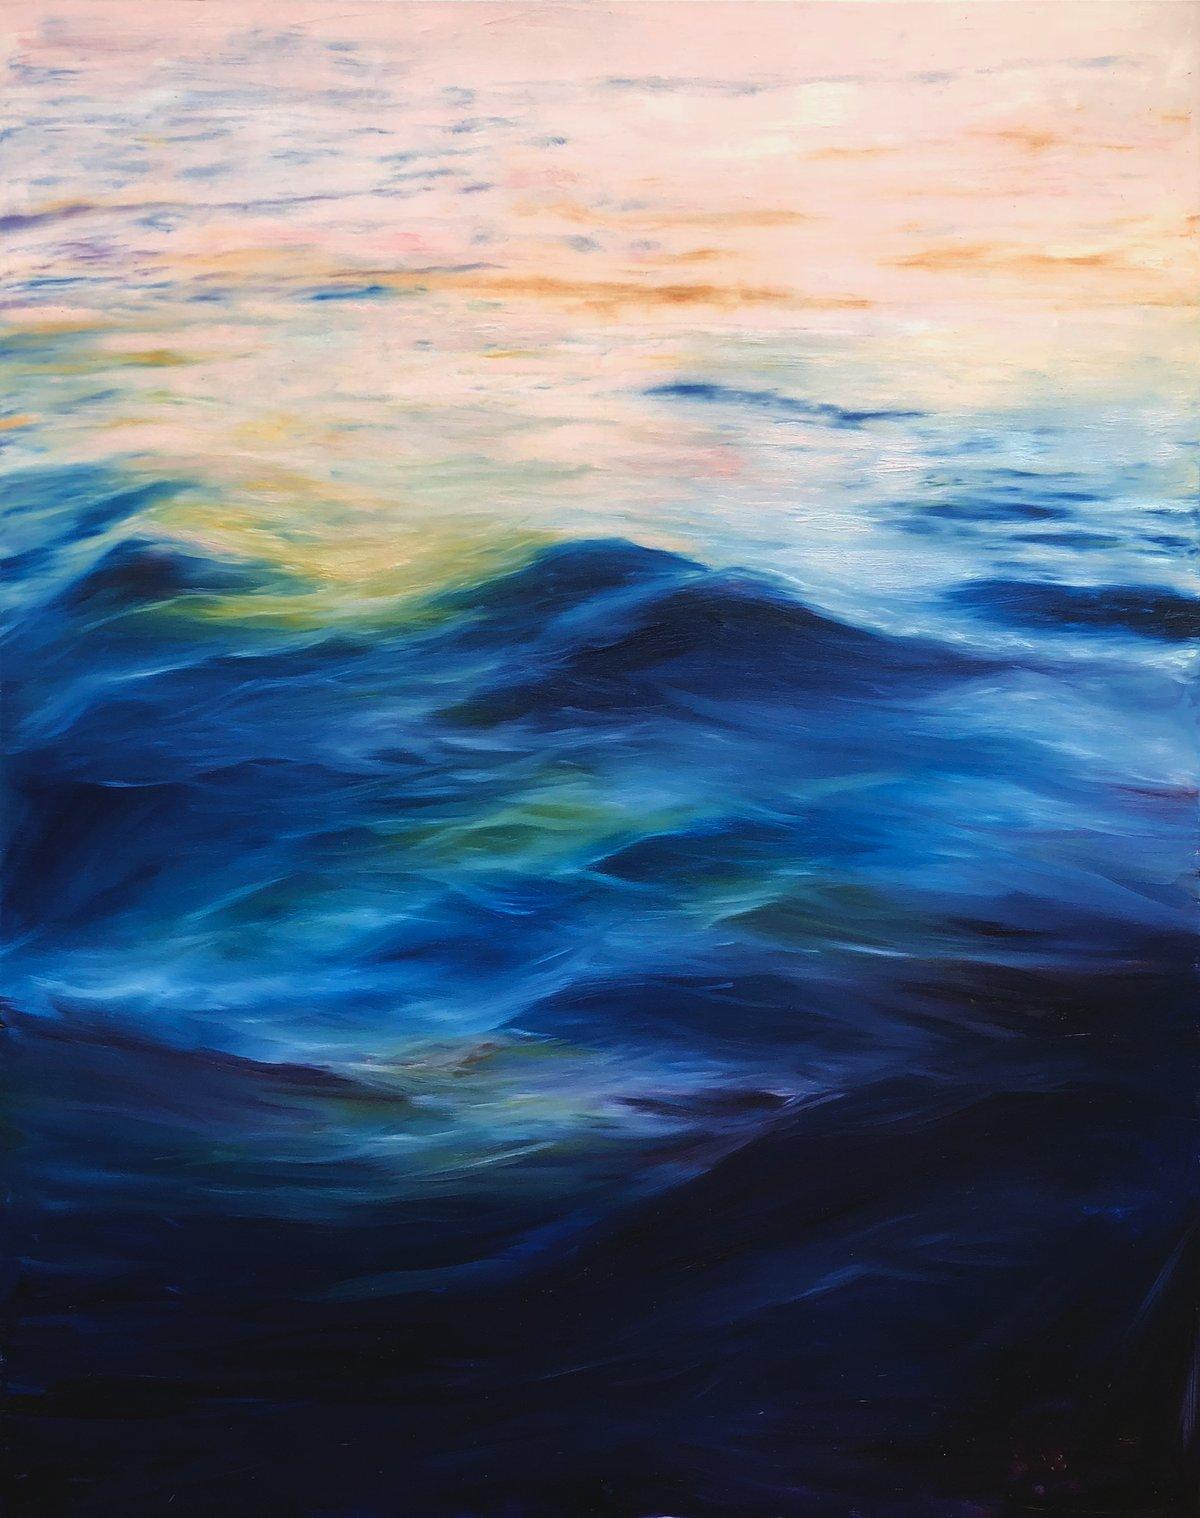 Image of Water No. 19